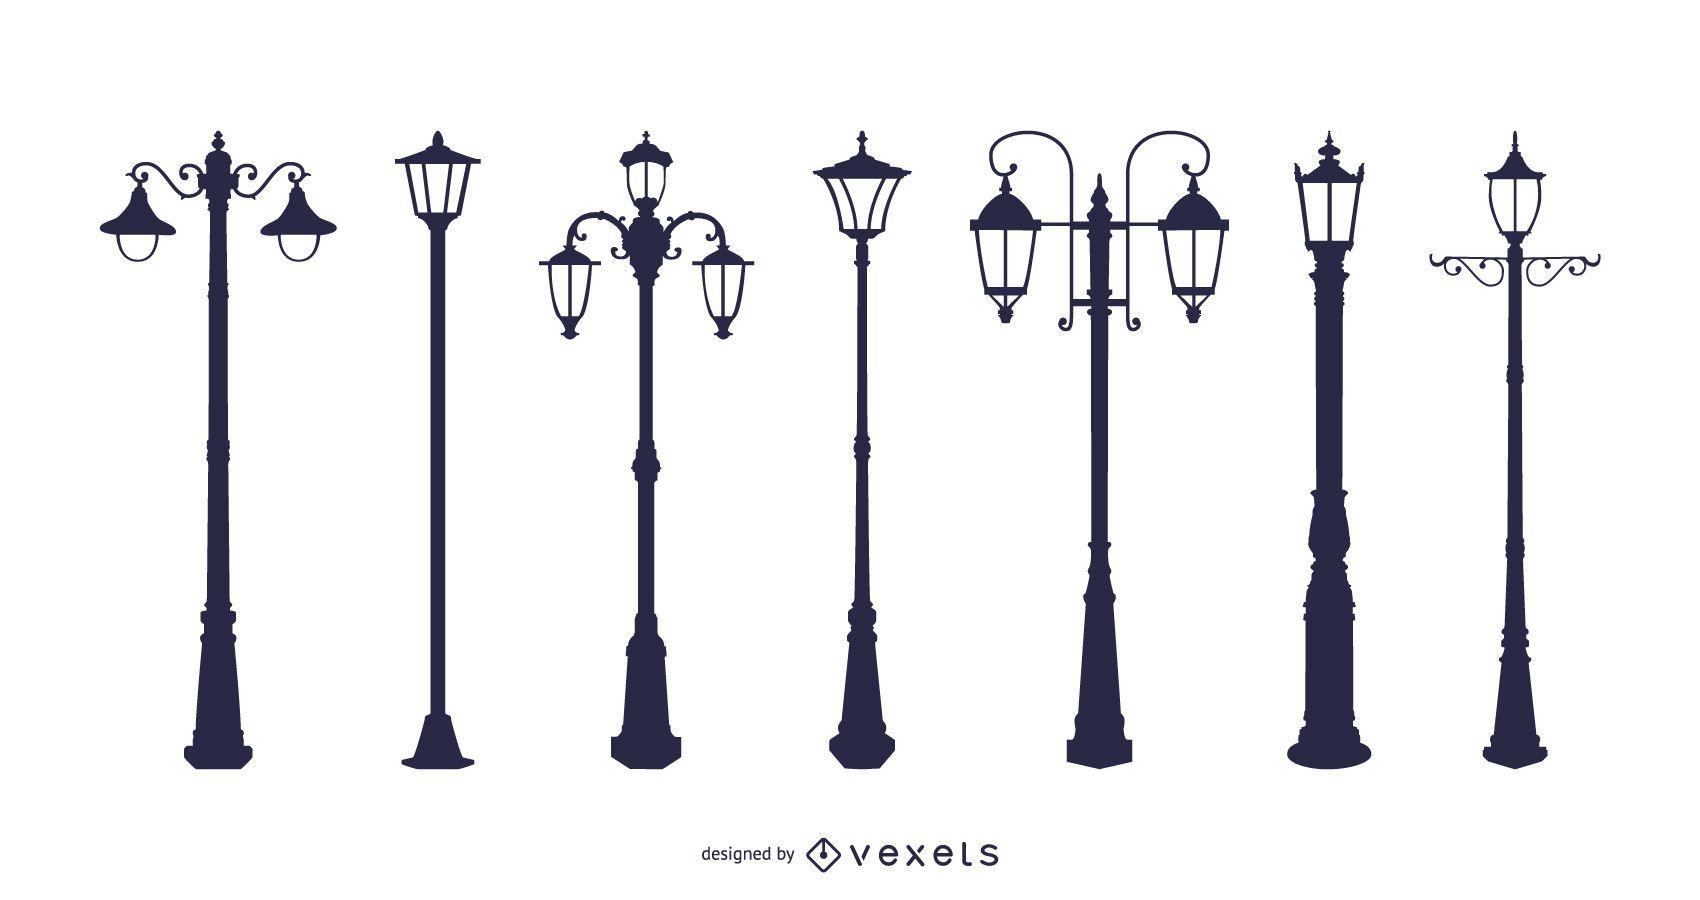 Europeanstyle Street Lamps Chandelier Lamp Vector